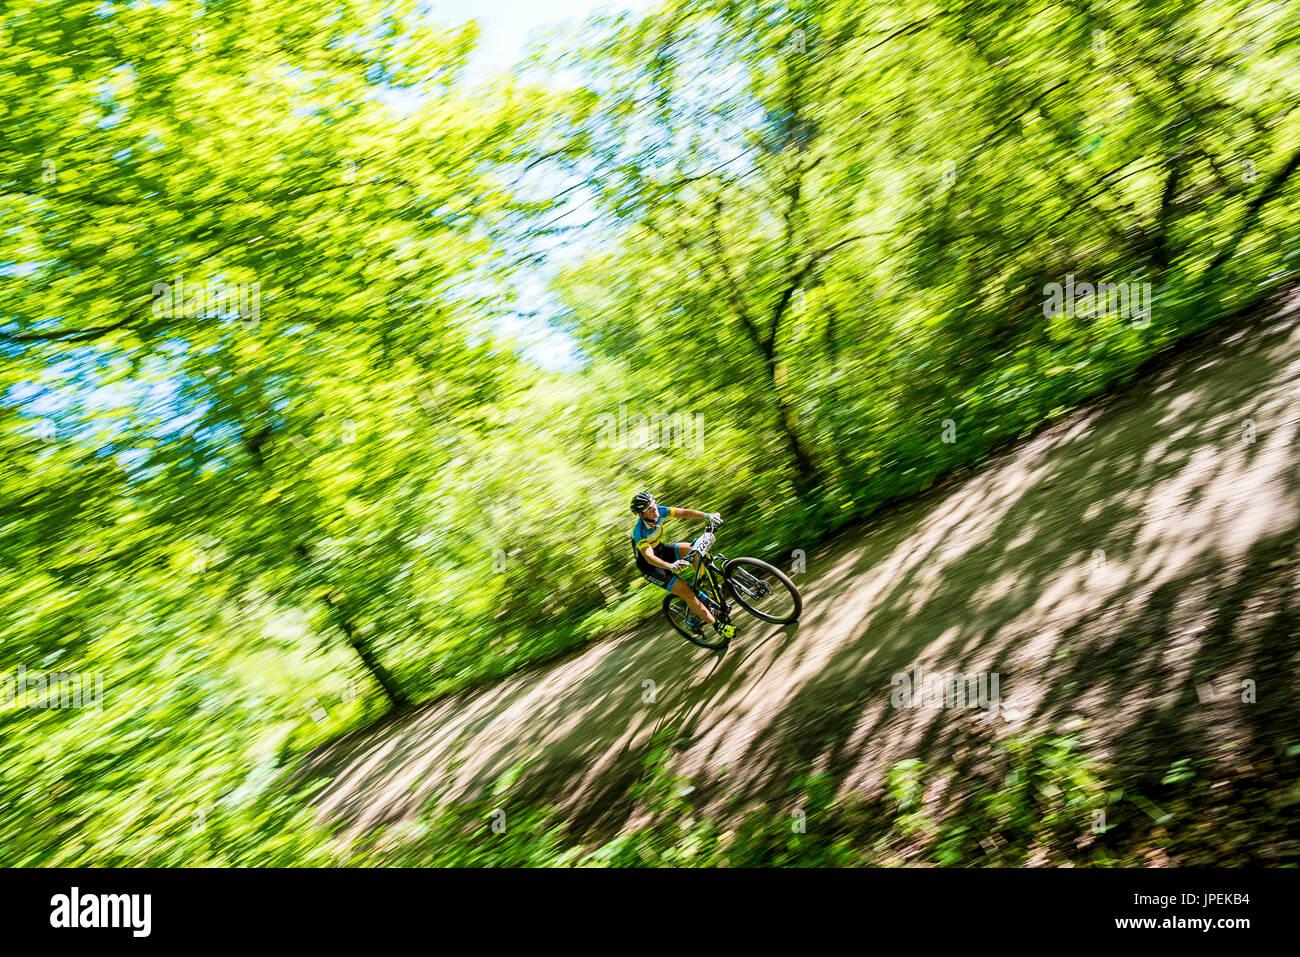 MTB Race Schatzberg Rennen - Diessen am Ammersee, Bavaria, Germany - Stock Image